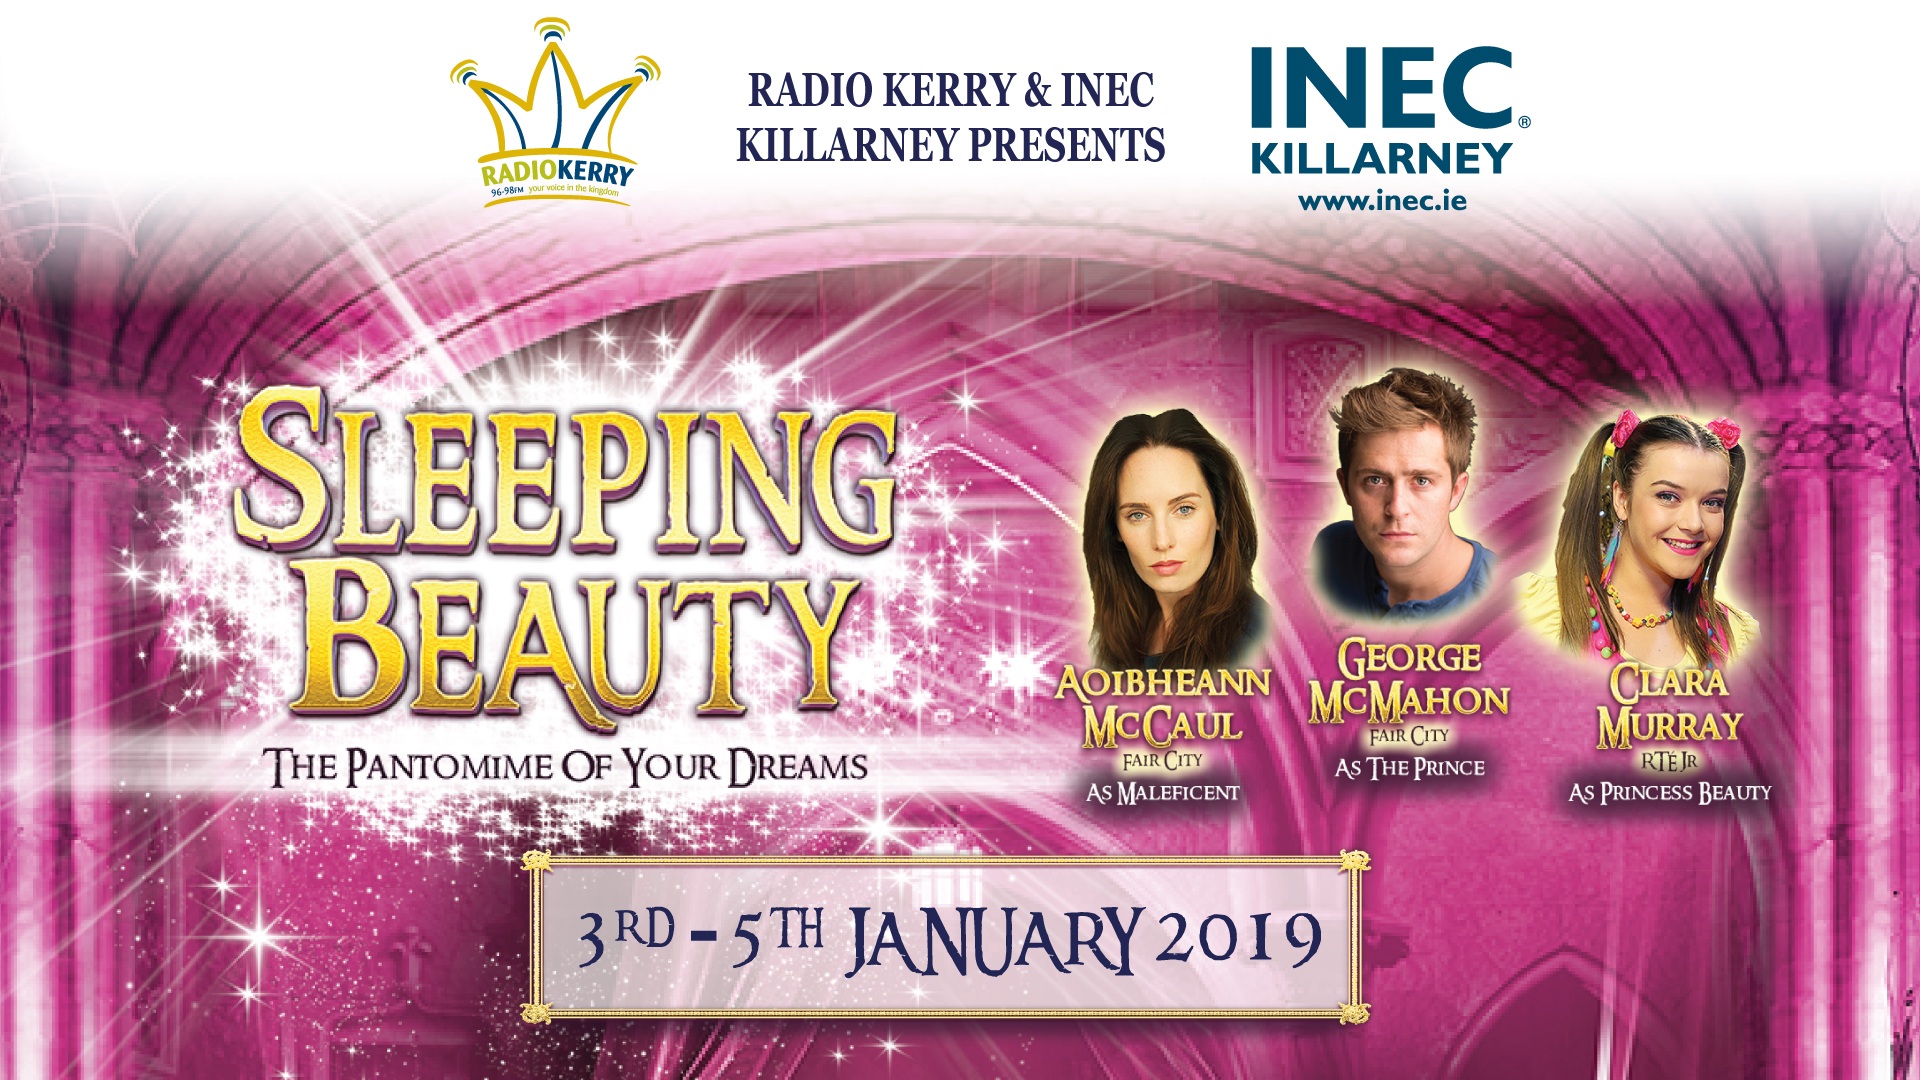 Sleeping Beauty Panto comes to the INEC Killarney on Jan 3-5 2019